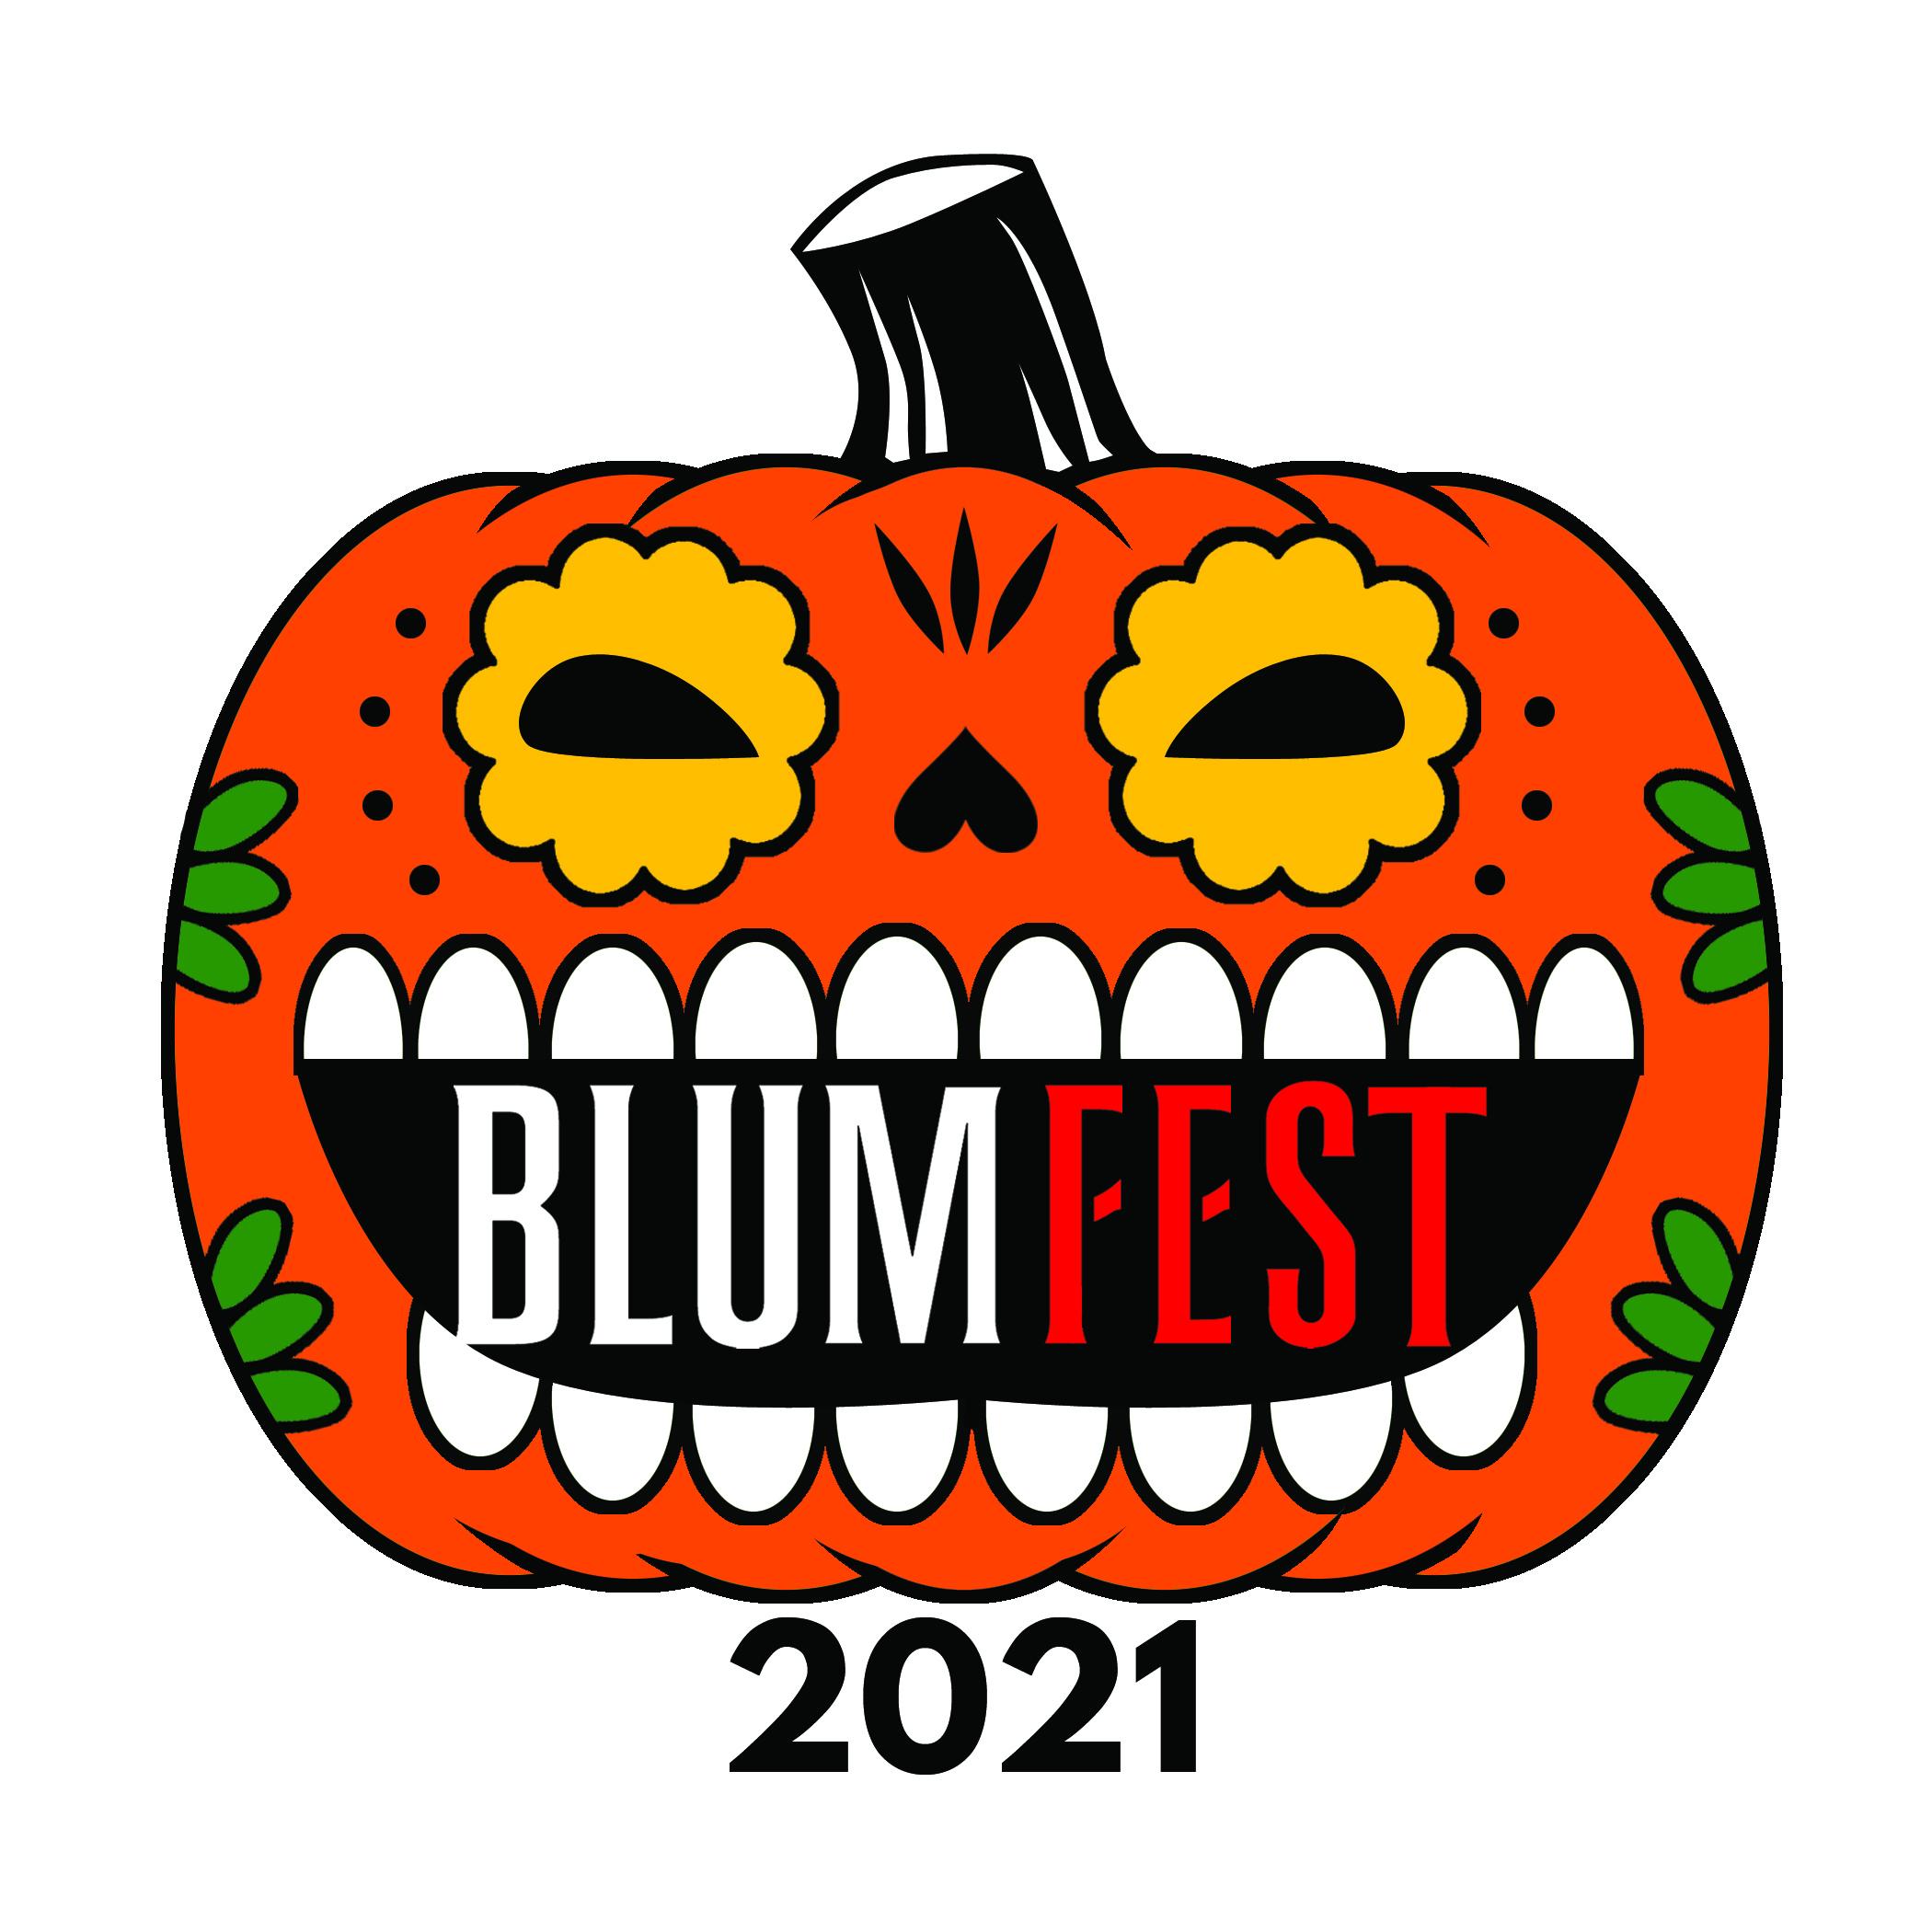 BlumFest 2021 logo